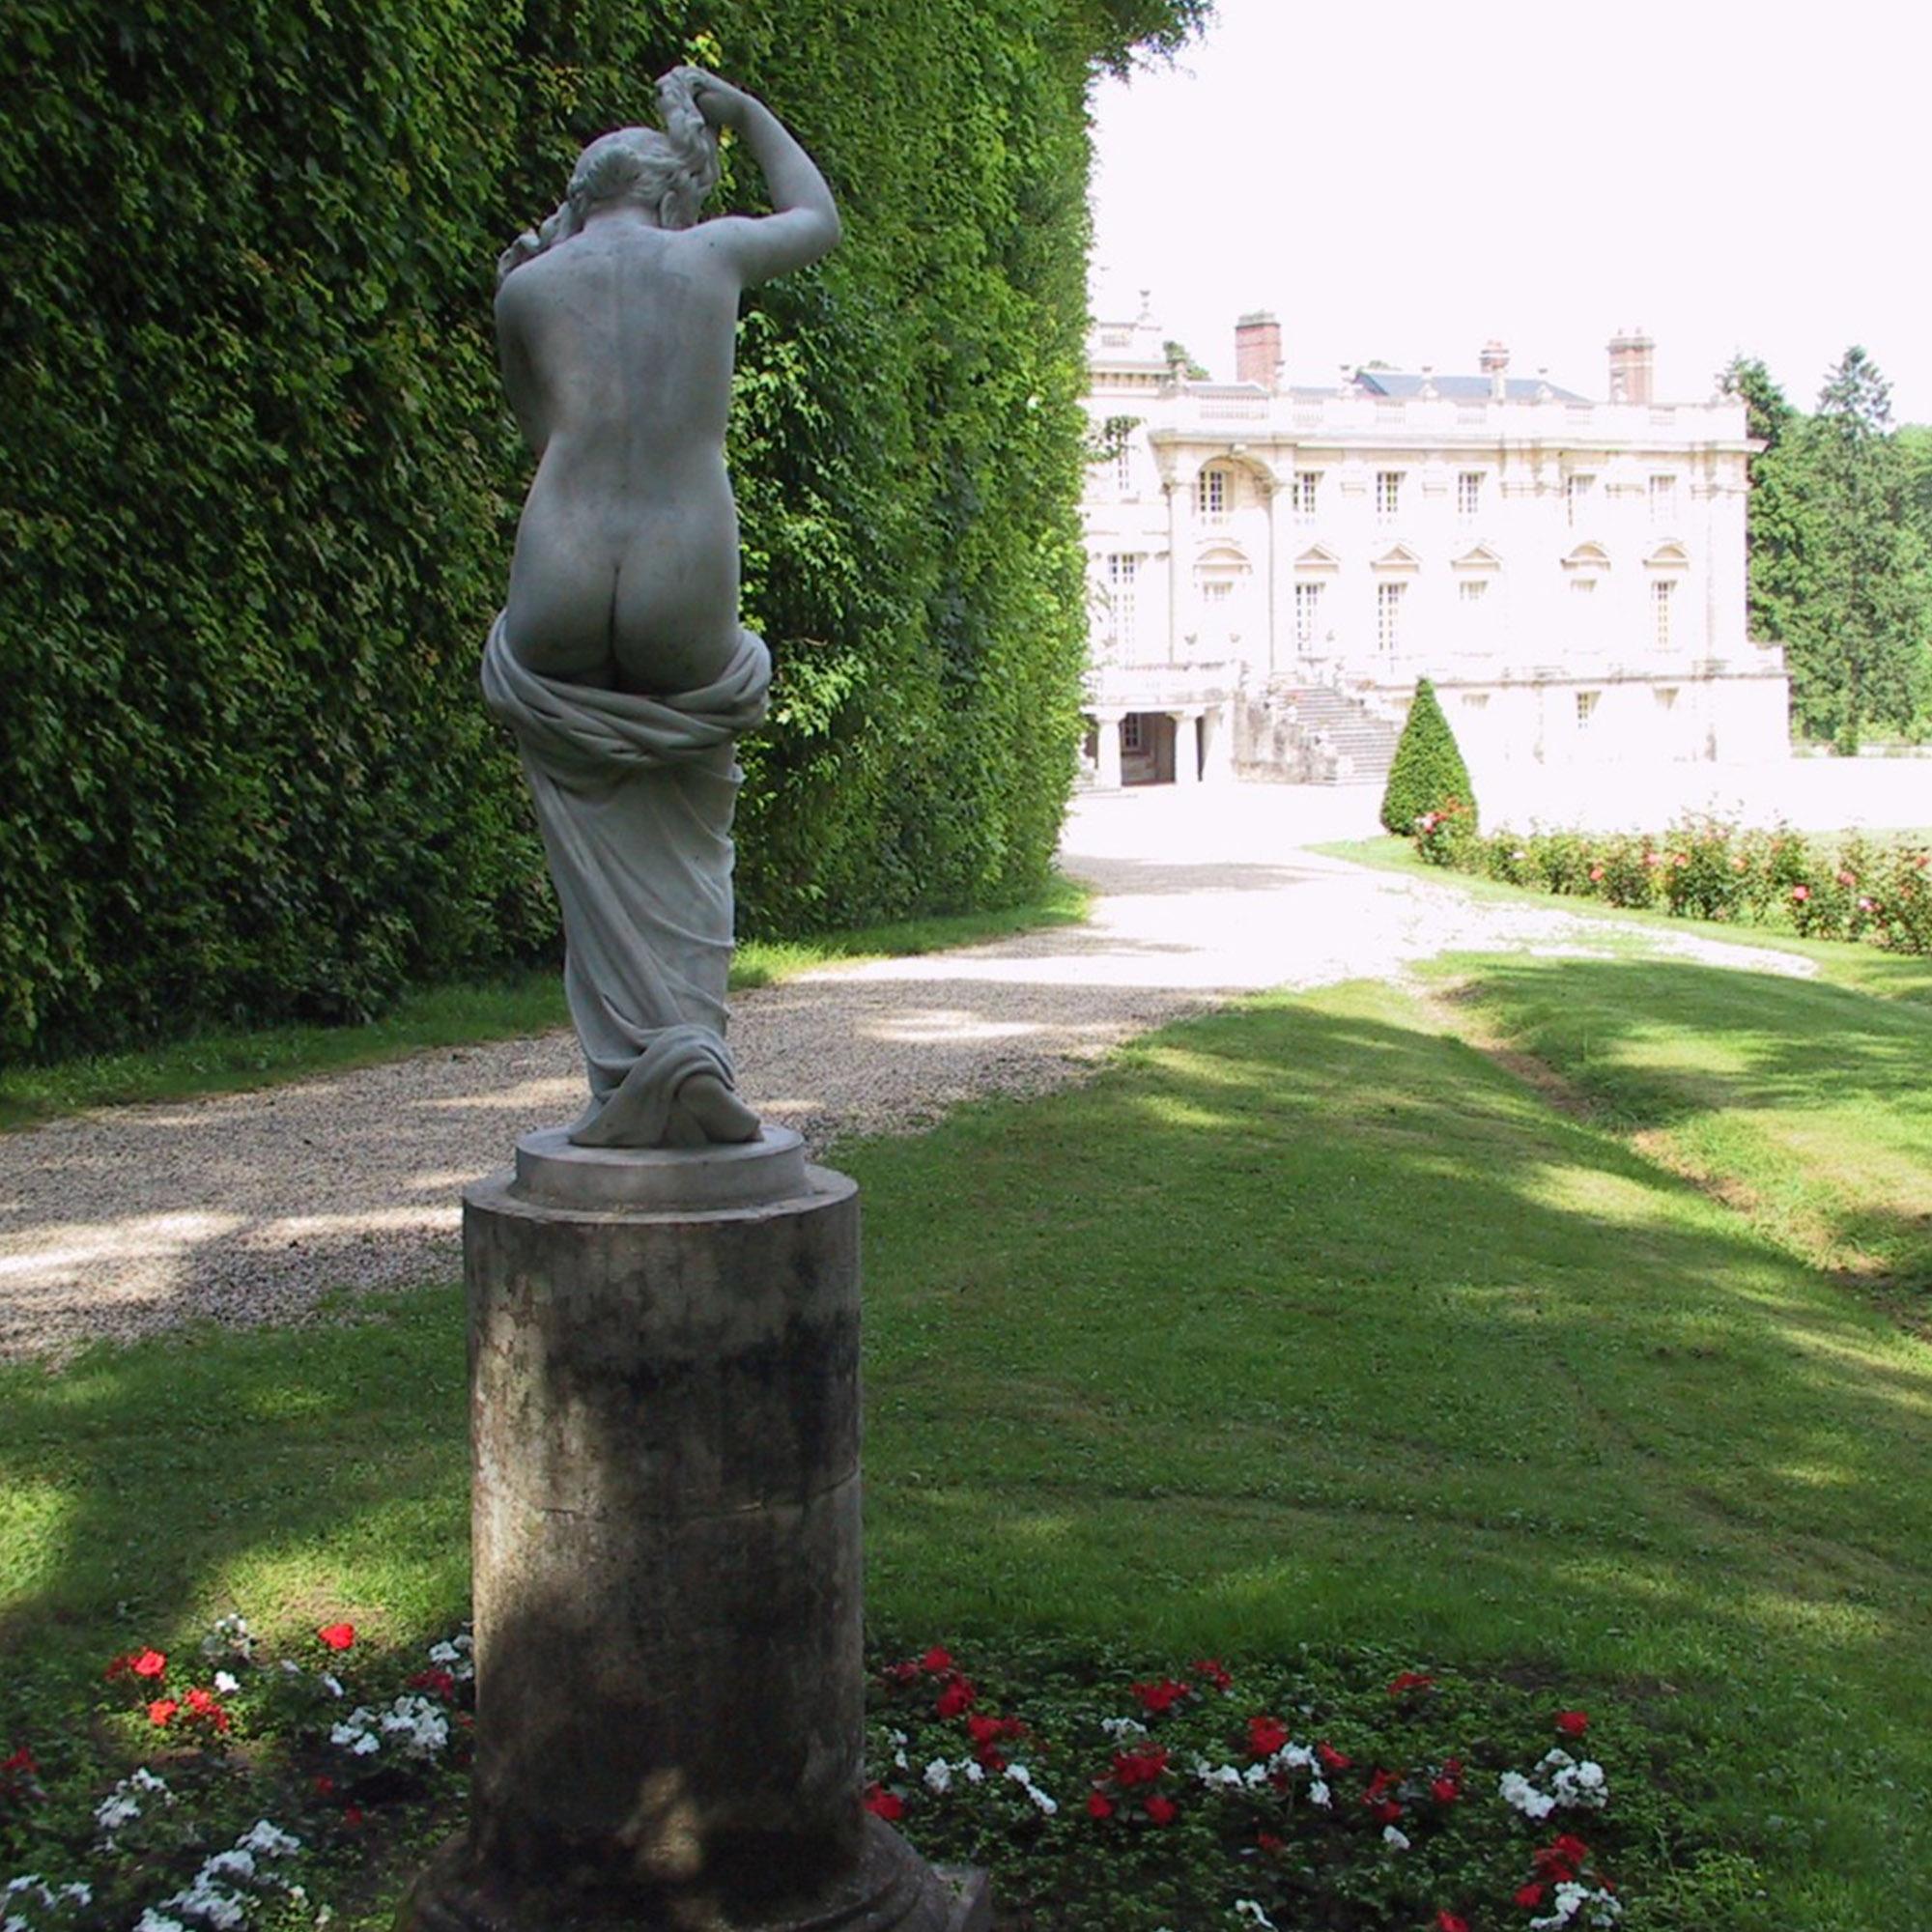 chateau_de_Versigny_gîte_saint_germain_oise_versigny_1